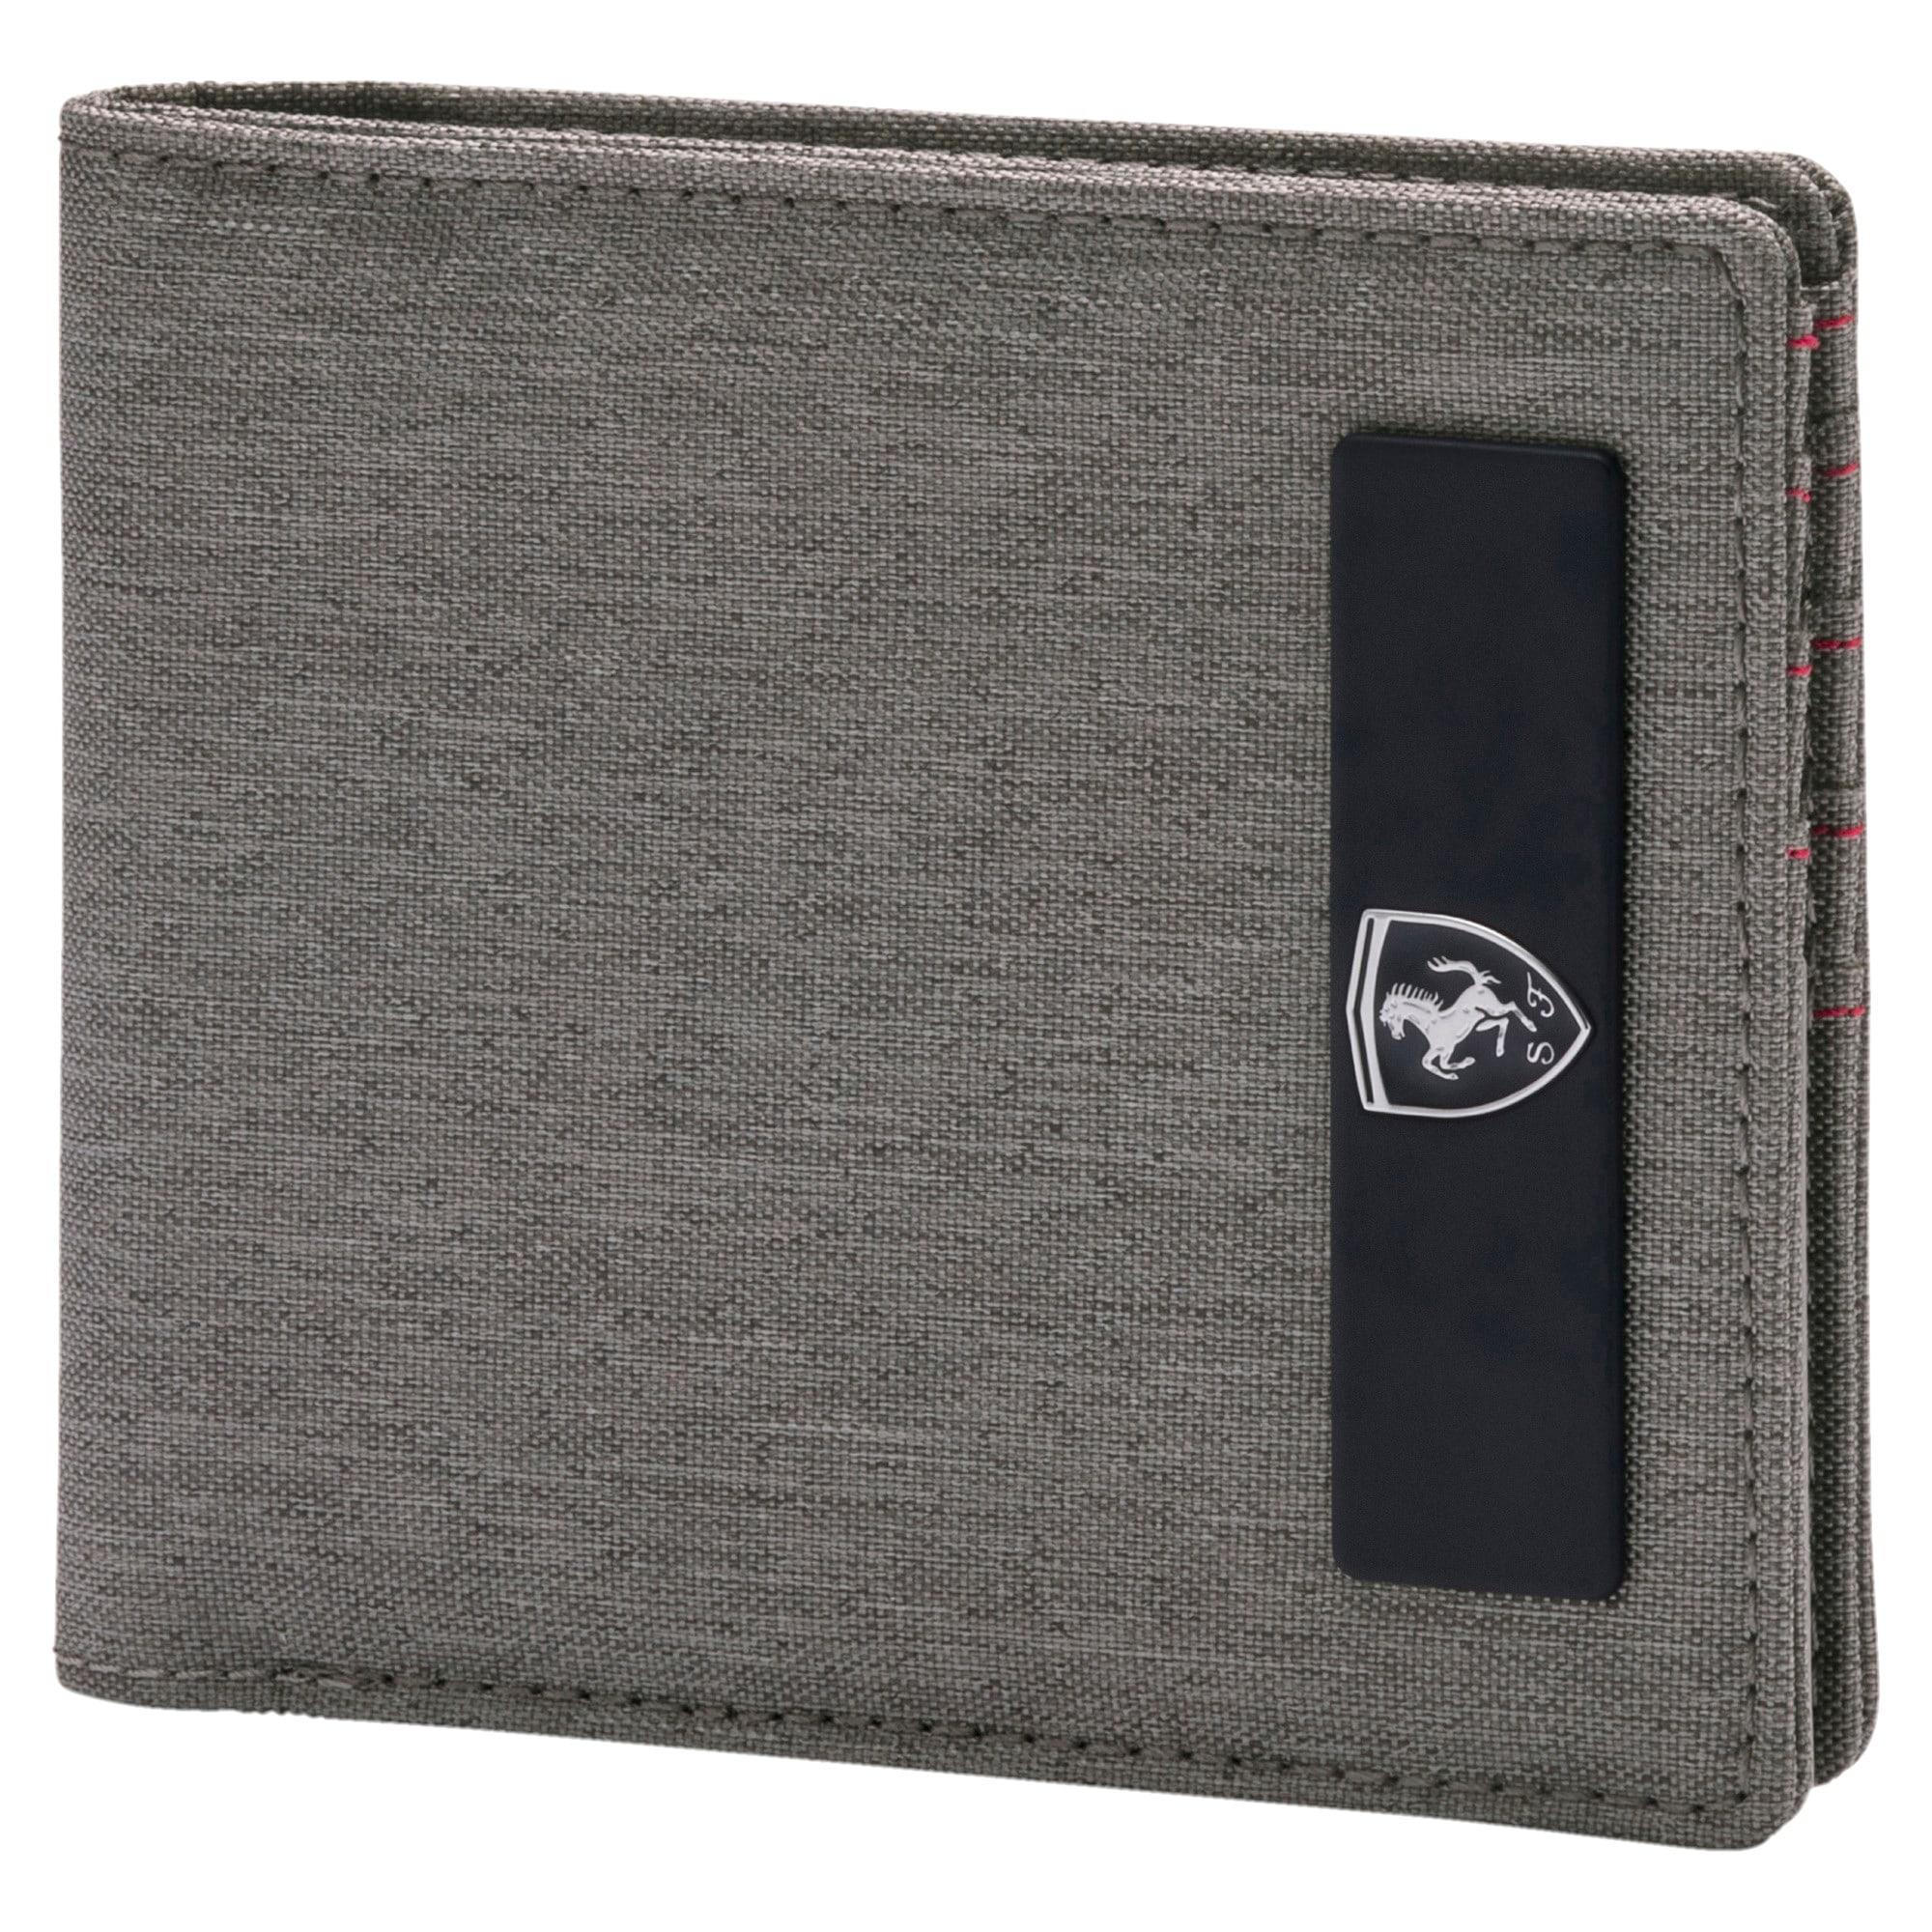 Thumbnail 1 of Scuderia Ferrari Lifestyle Wallet, Charcoal Gray, medium